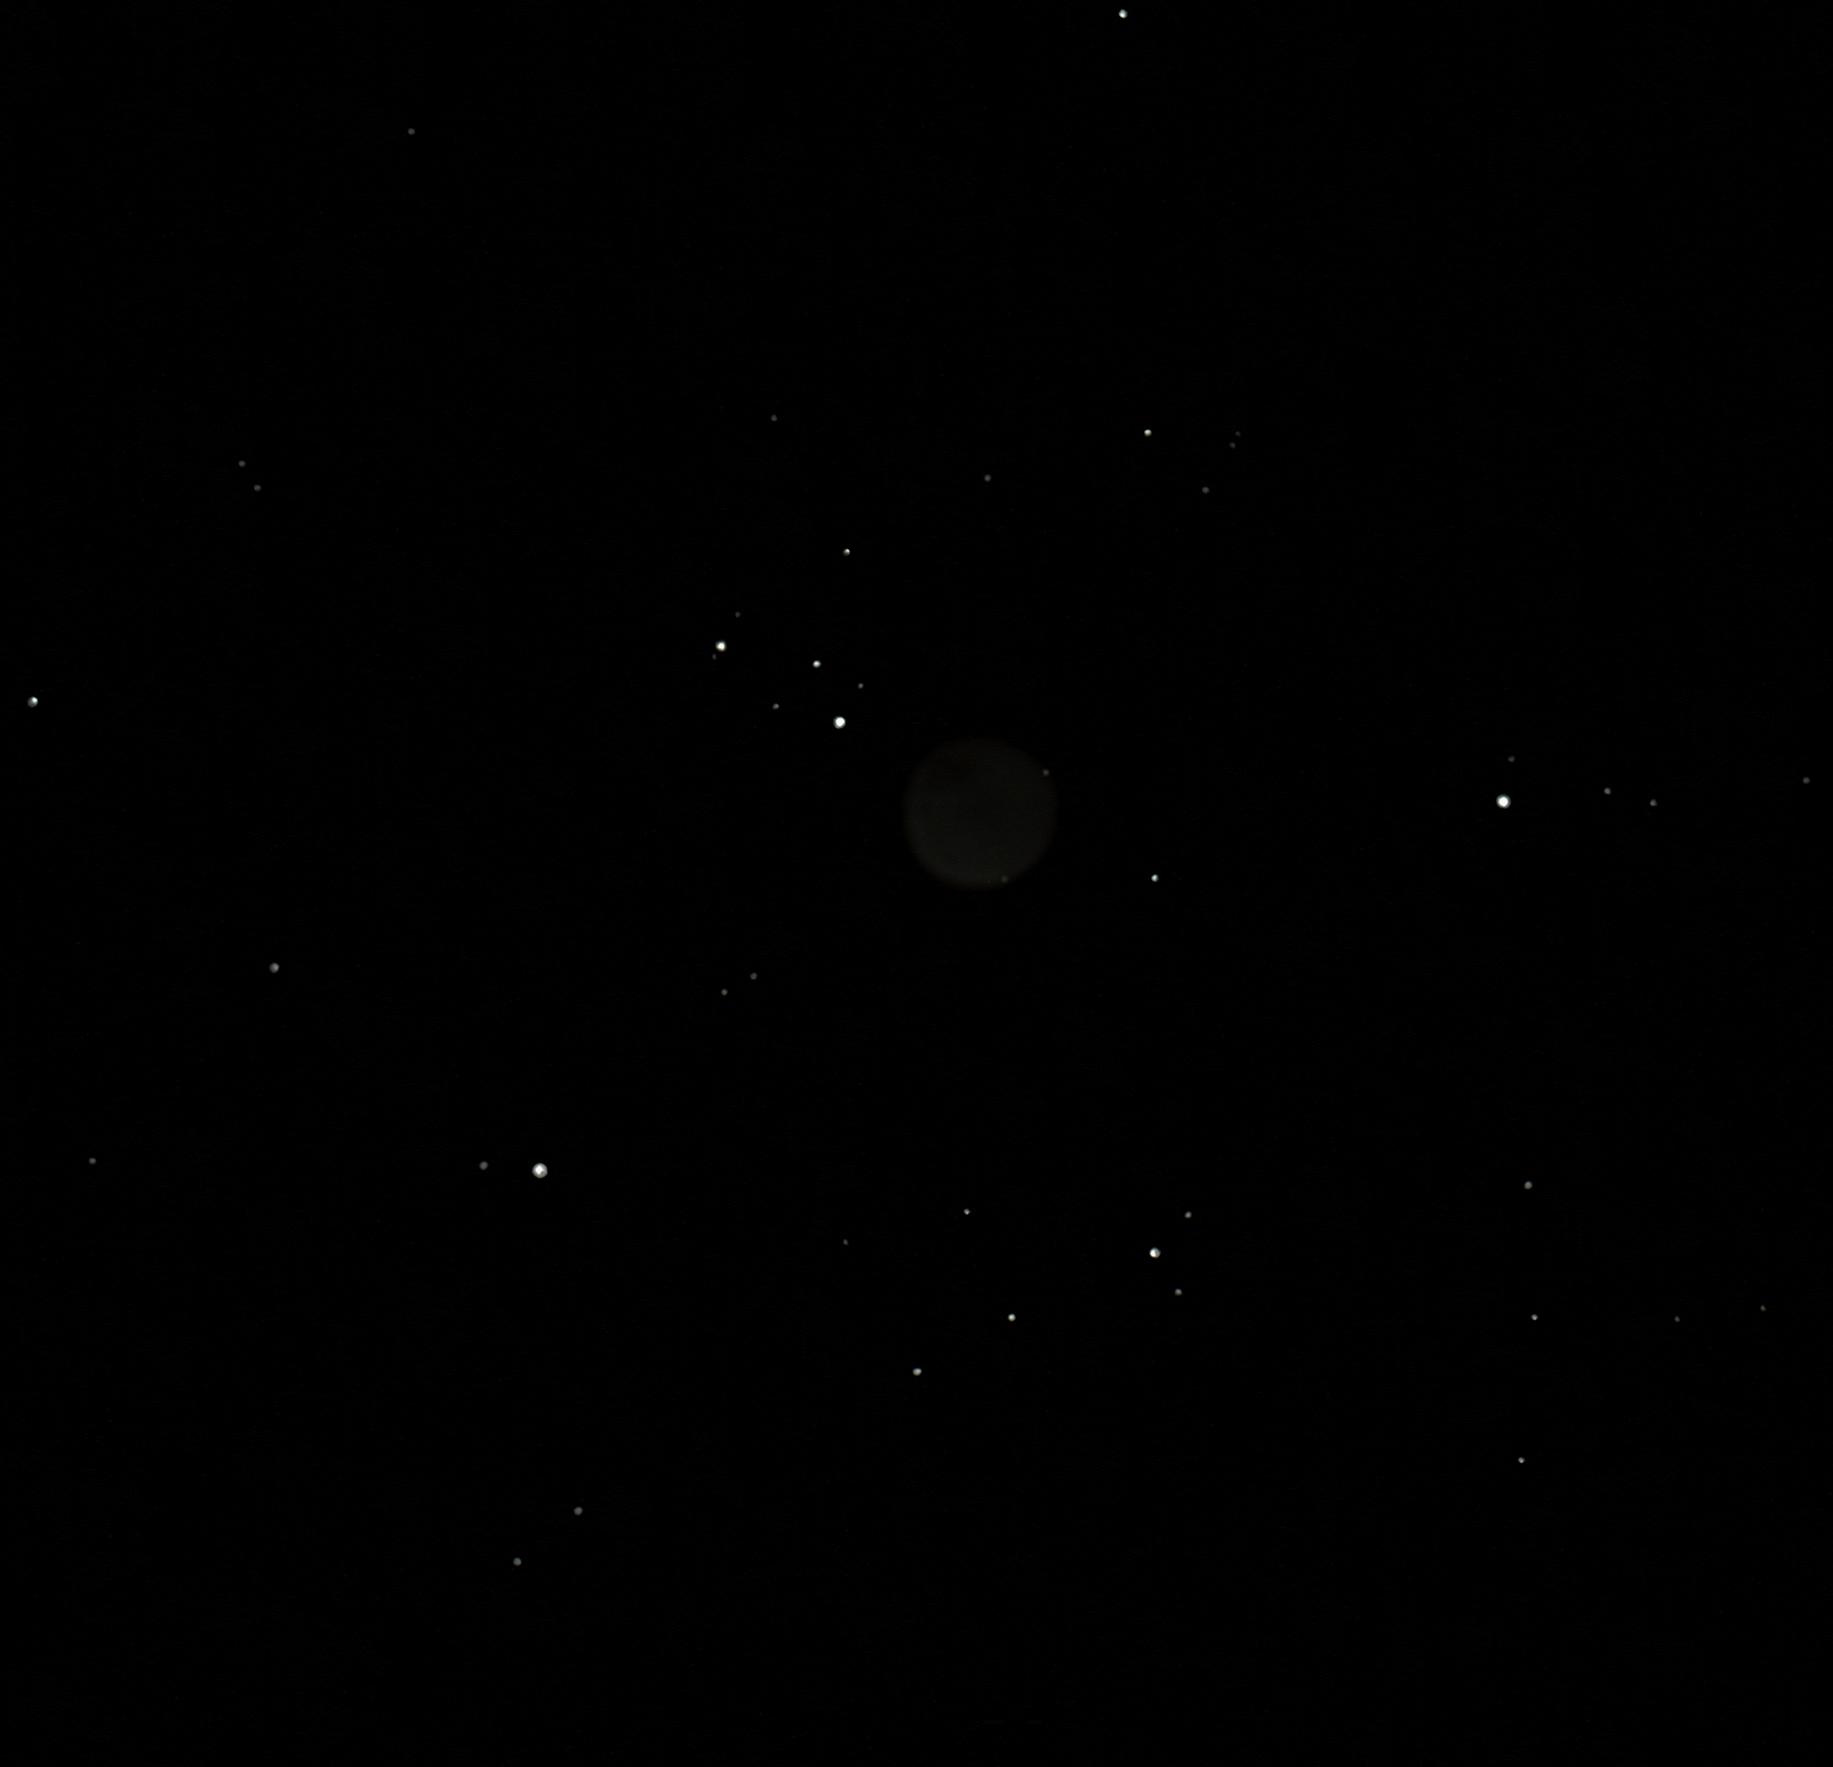 ngc 7048 planetary nebula